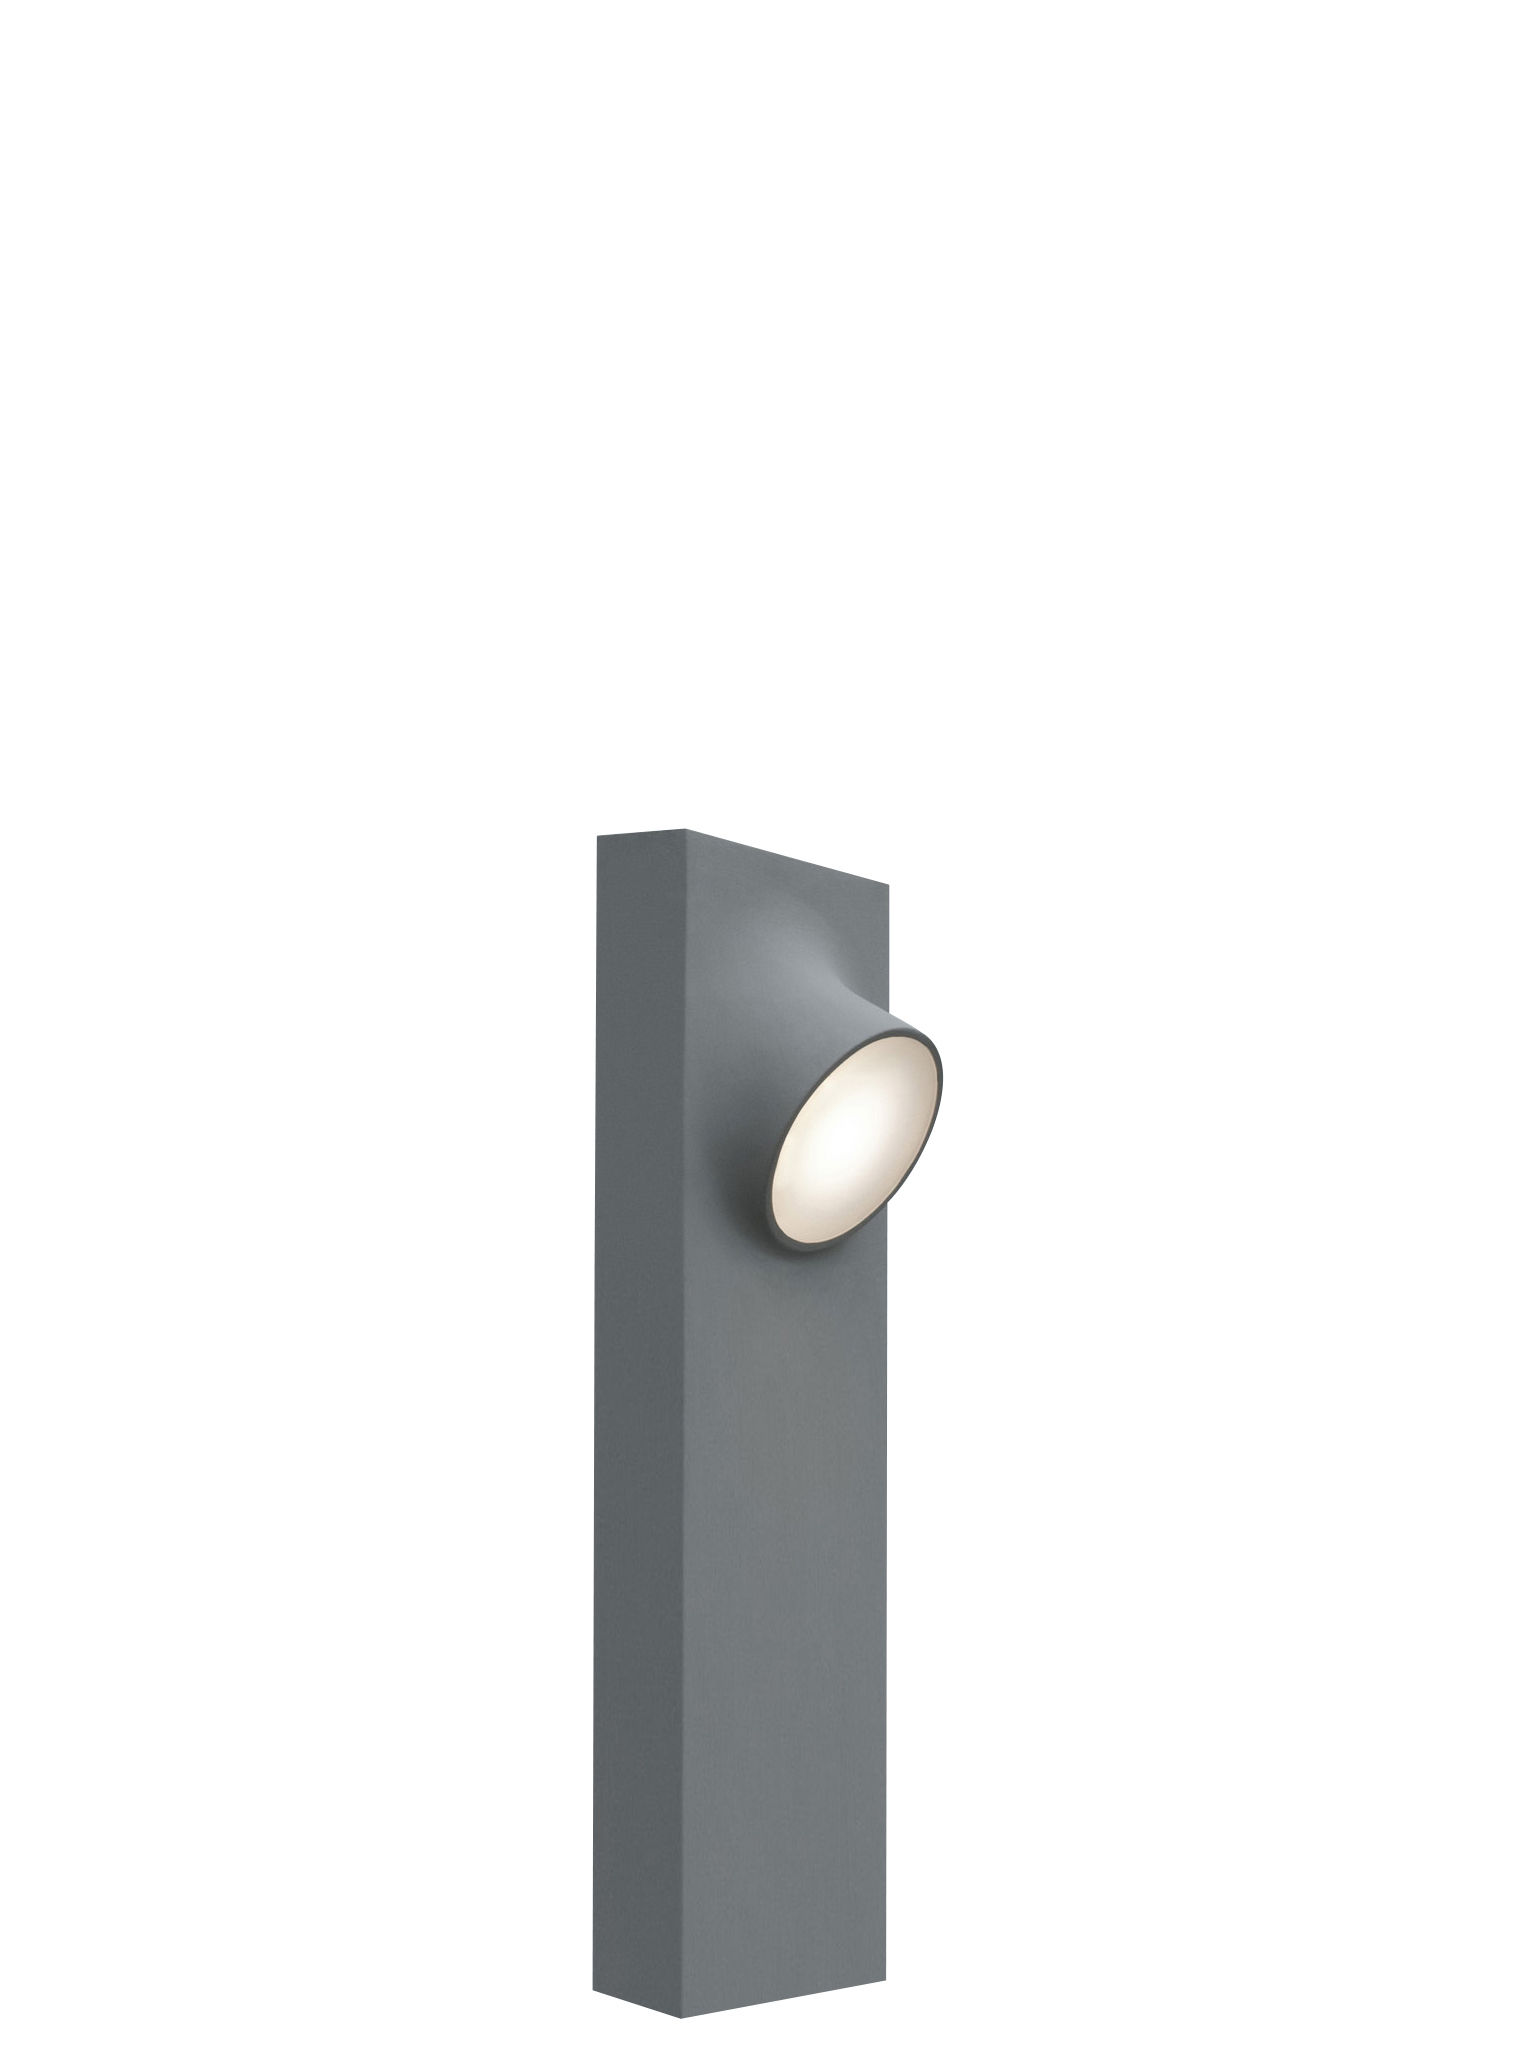 Leuchten - Außenleuchten - Ciclope Double LED Bodenleuchte für außen - H 50 cm - Artemide - Grau - H 50 cm - Aluminium galvanisé